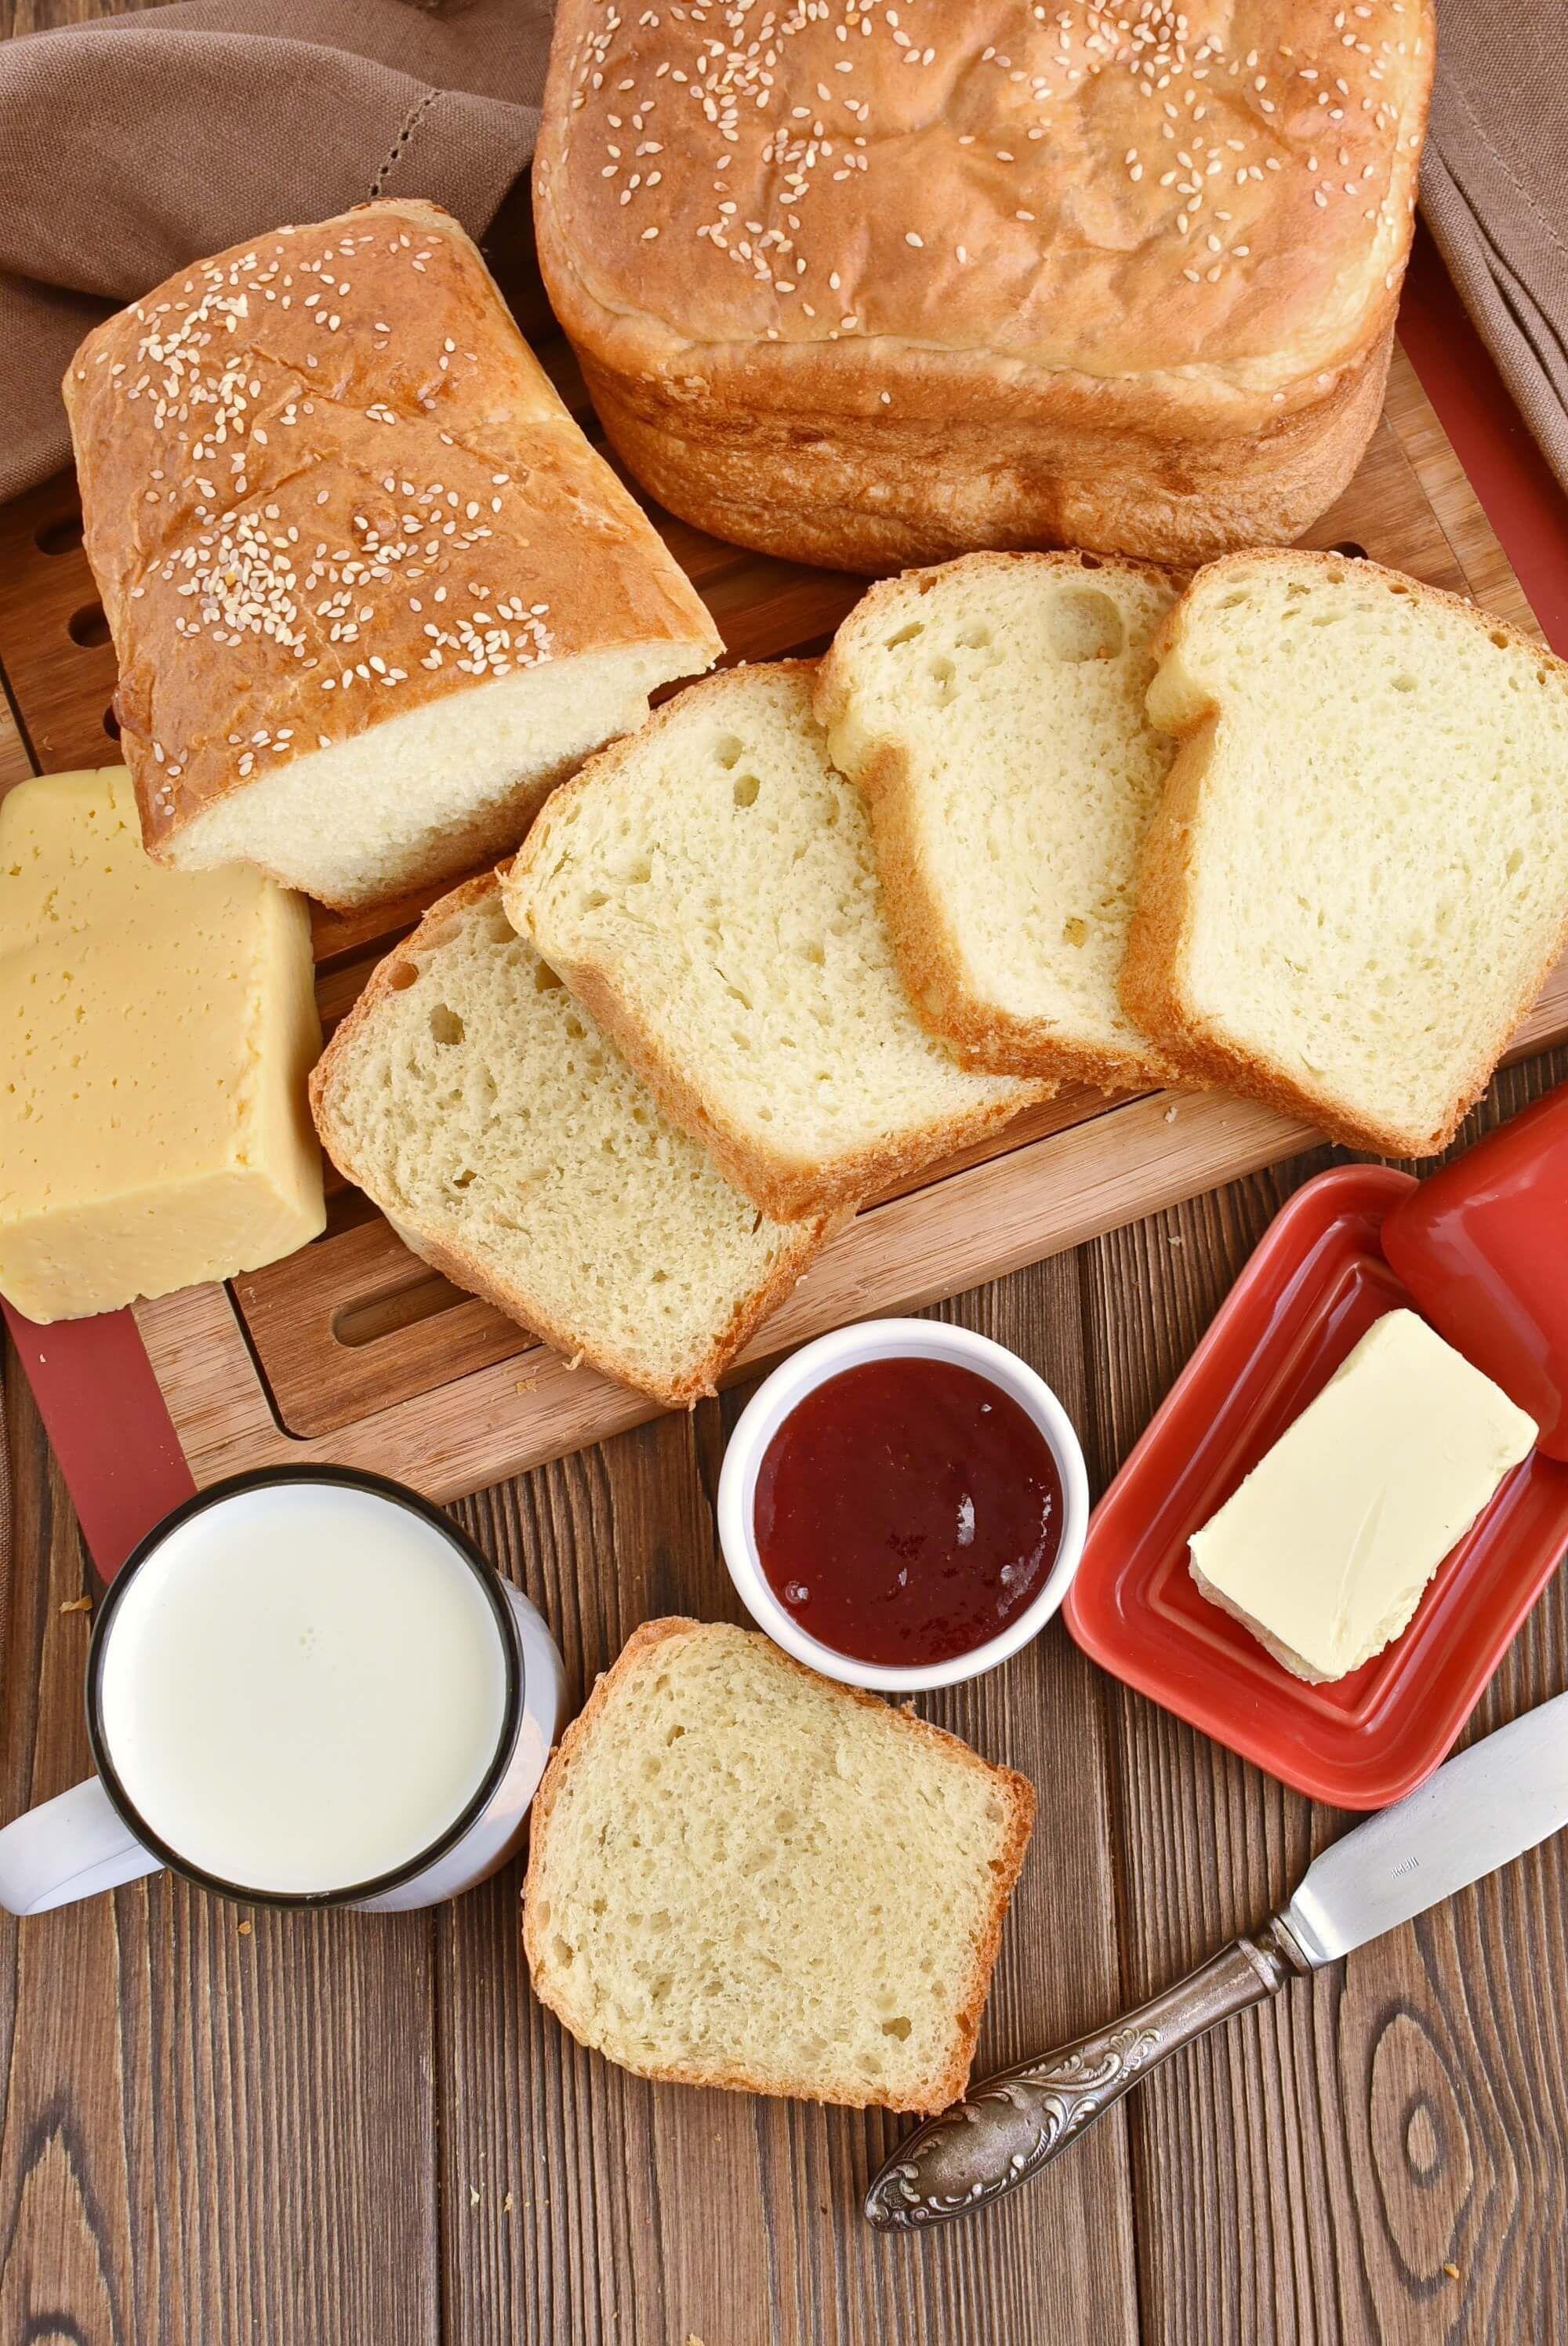 Bread Machine Honey Buttermilk Bread Recipe Cook Me Recipes In 2020 Buttermilk Bread Honey Buttermilk Bread Bread Machine